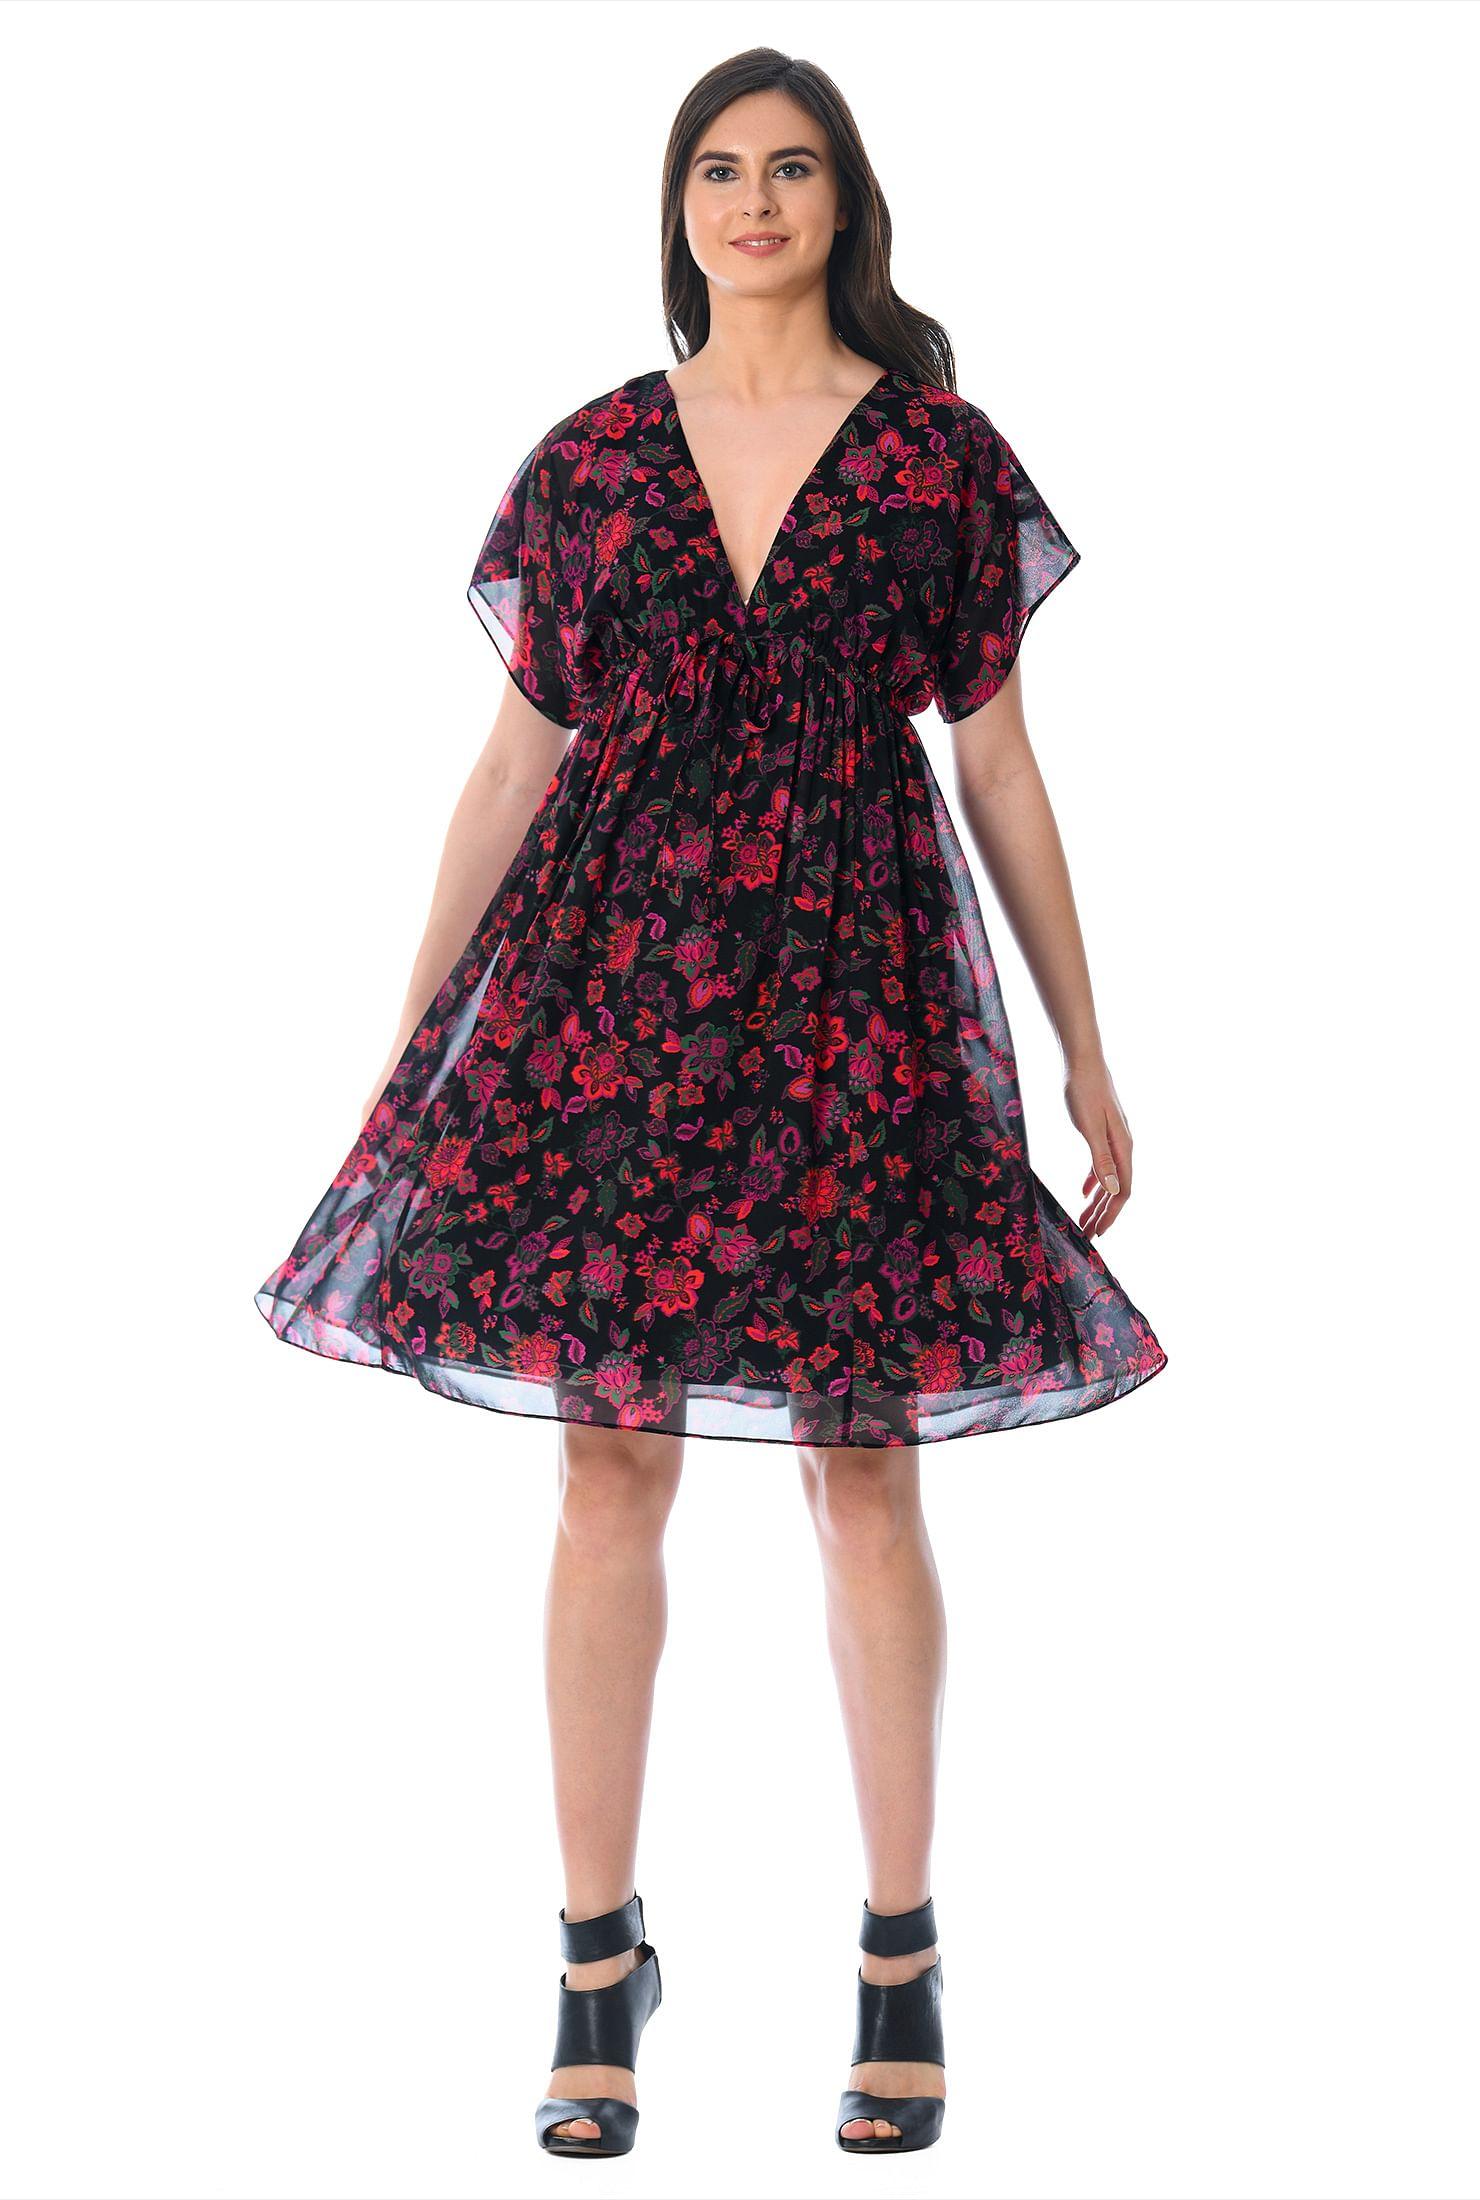 17915d617e8c4 Above knee length dresses, black dresses, blouson dresses, dolman sleeve  dresses,